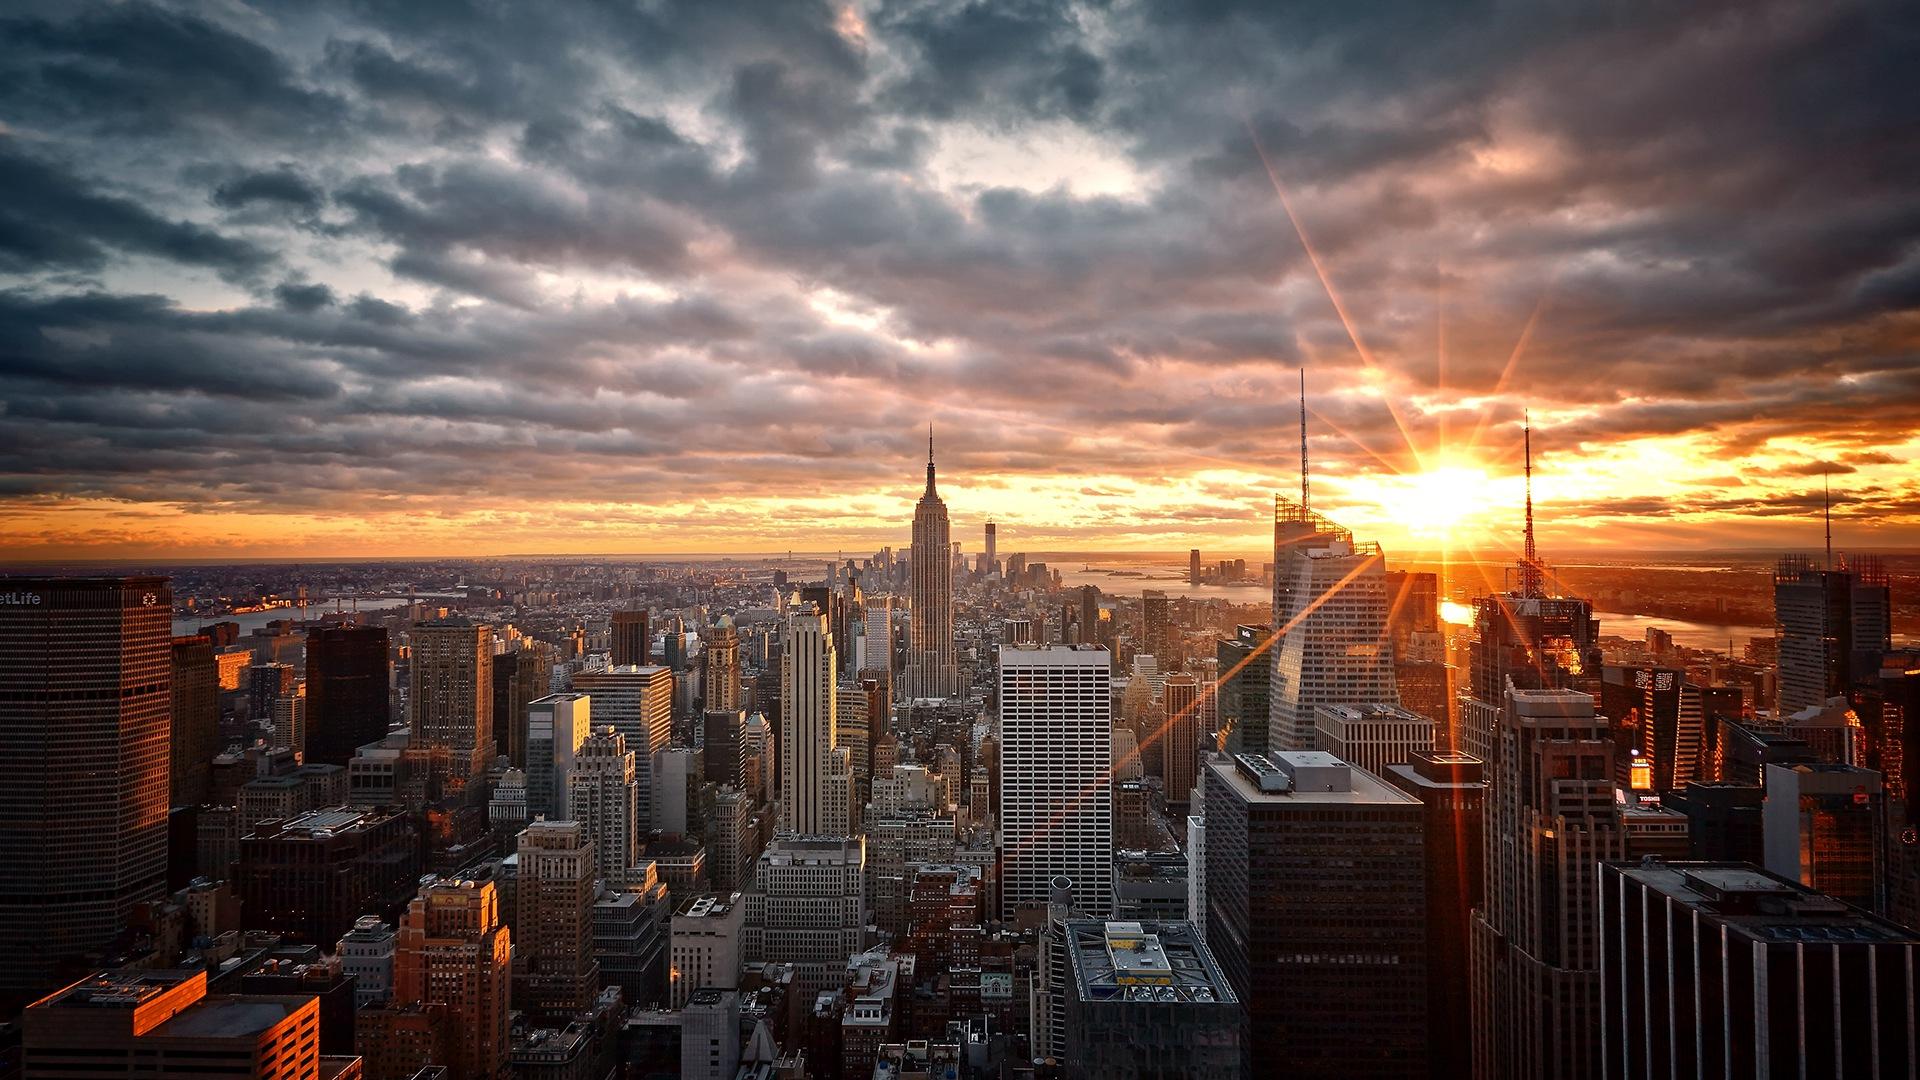 Manhattan New York Sunrise City Skys Wallpaper 17368 1920x1080